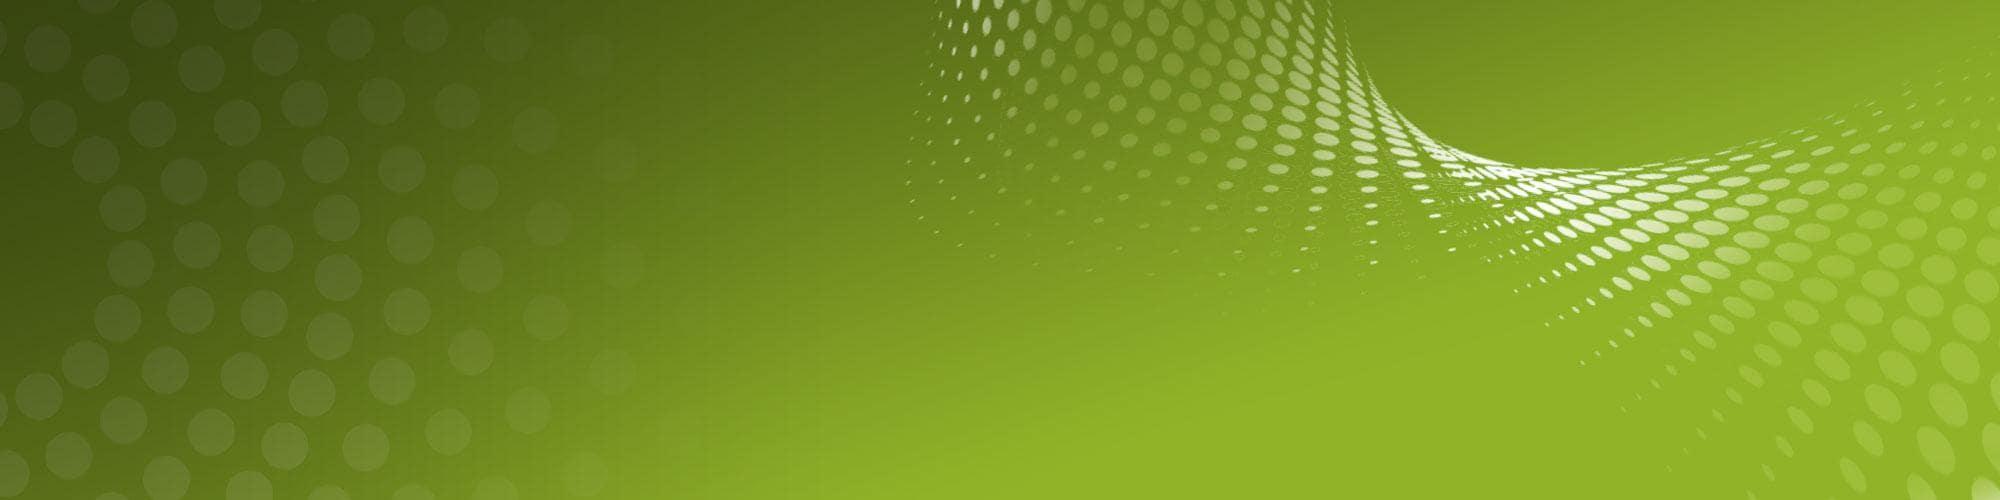 Lime green banner